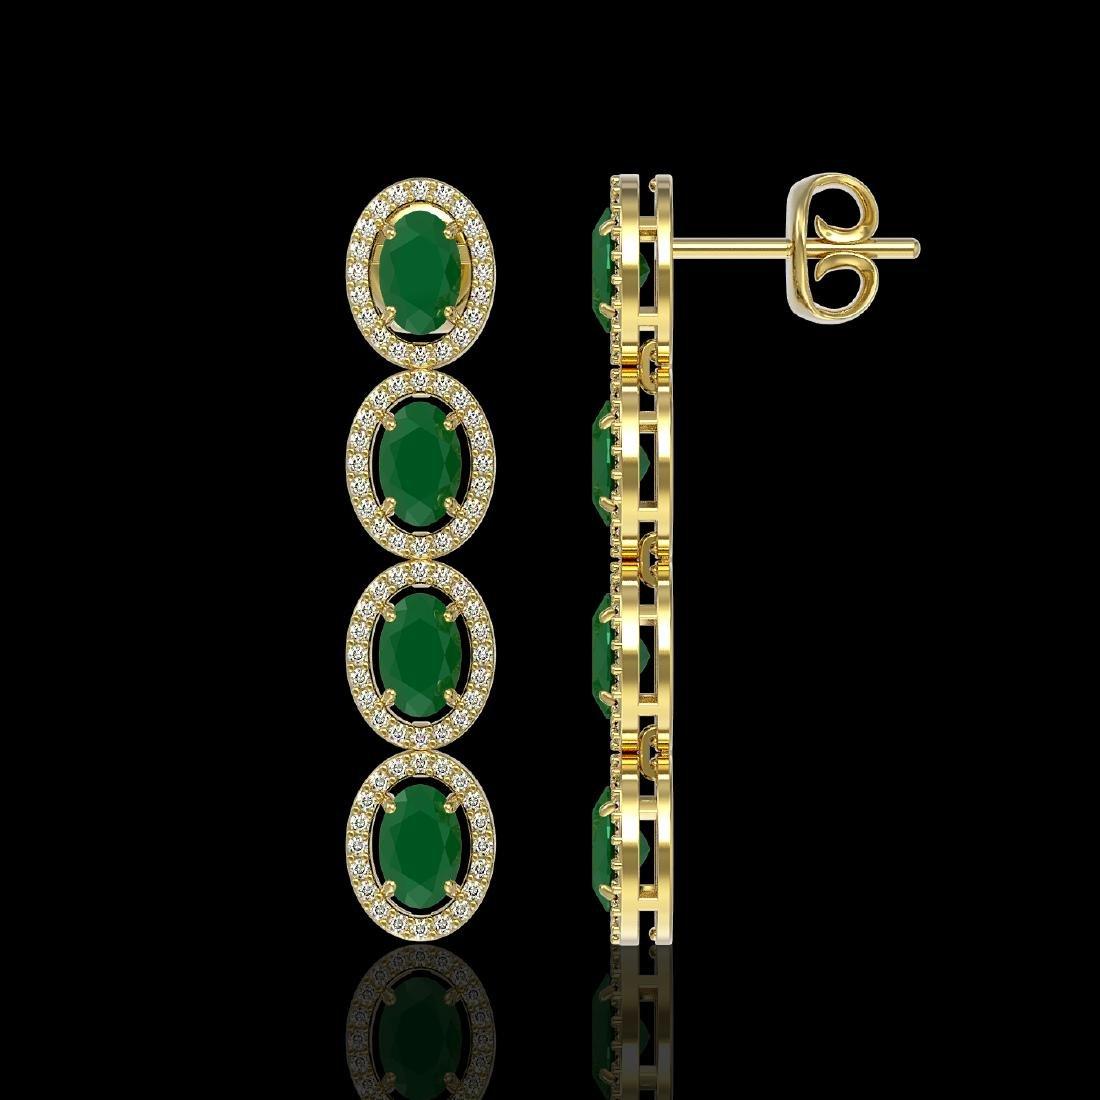 6.47 CTW Emerald & Diamond Halo Earrings 10K Yellow - 2